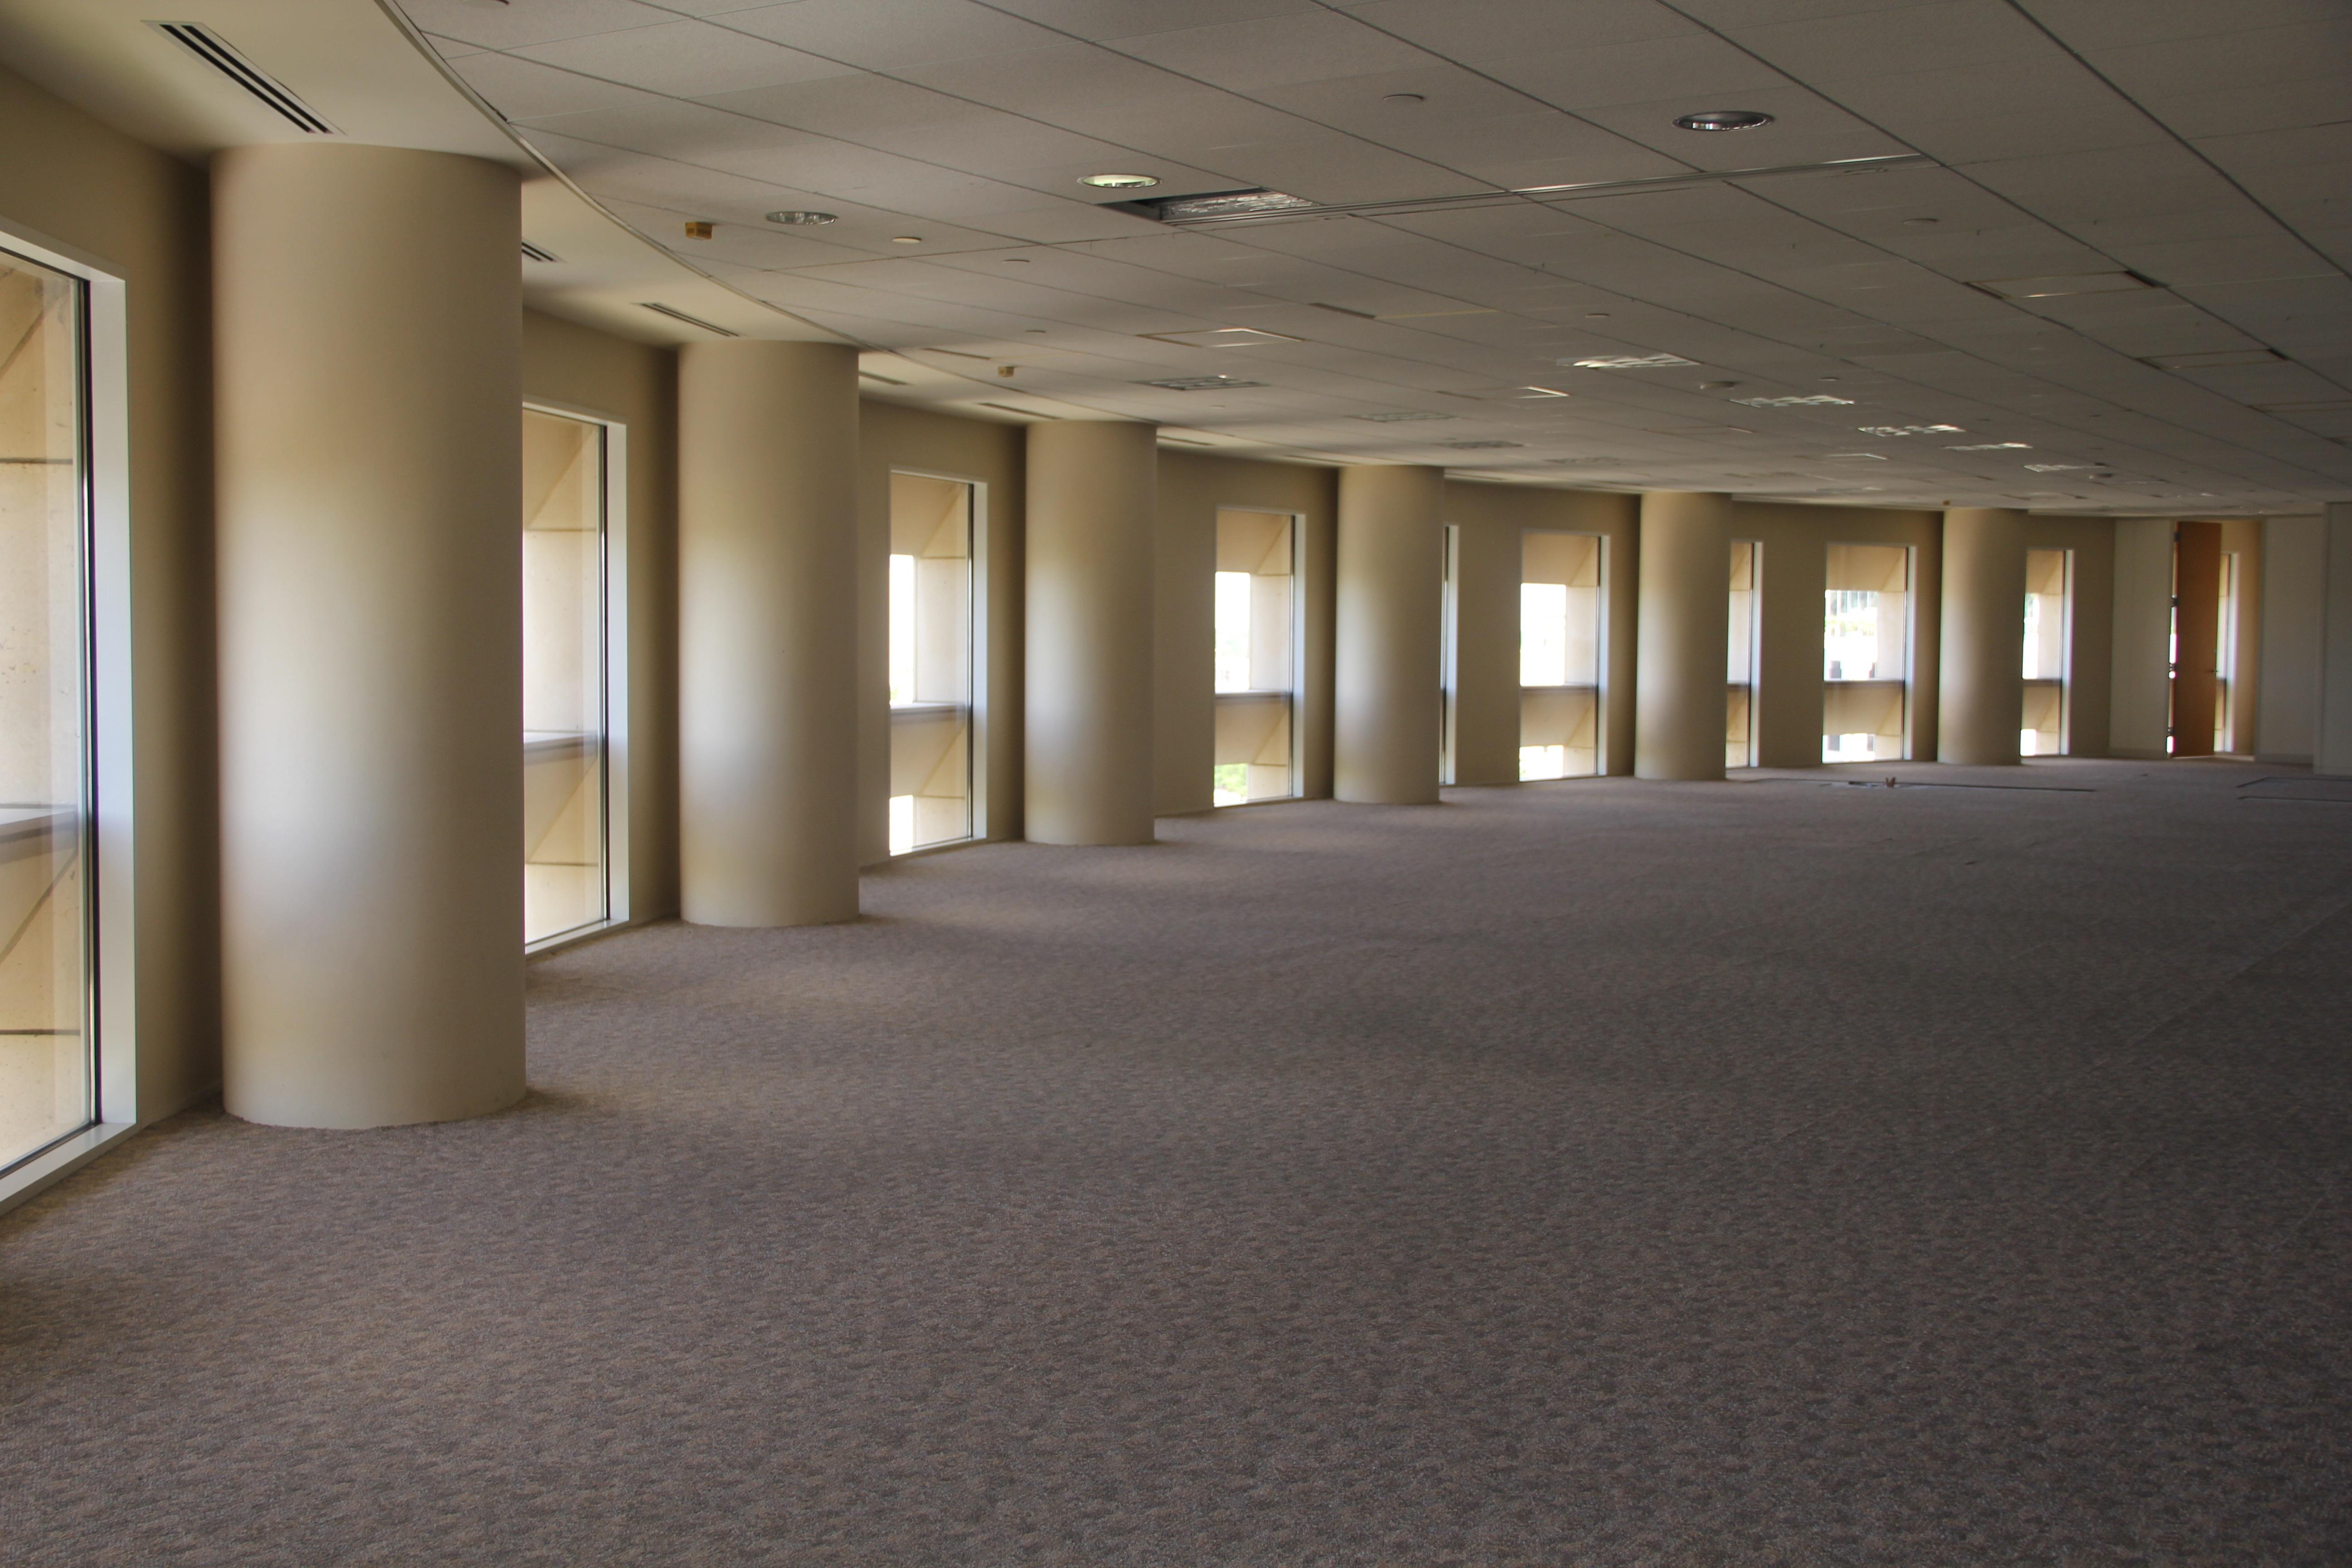 floor lighting hall. Work Architecture Floor Ceiling Hall Corporate Office Empty Business Lighting Interior Design Estate Lobby Headquarters Flooring